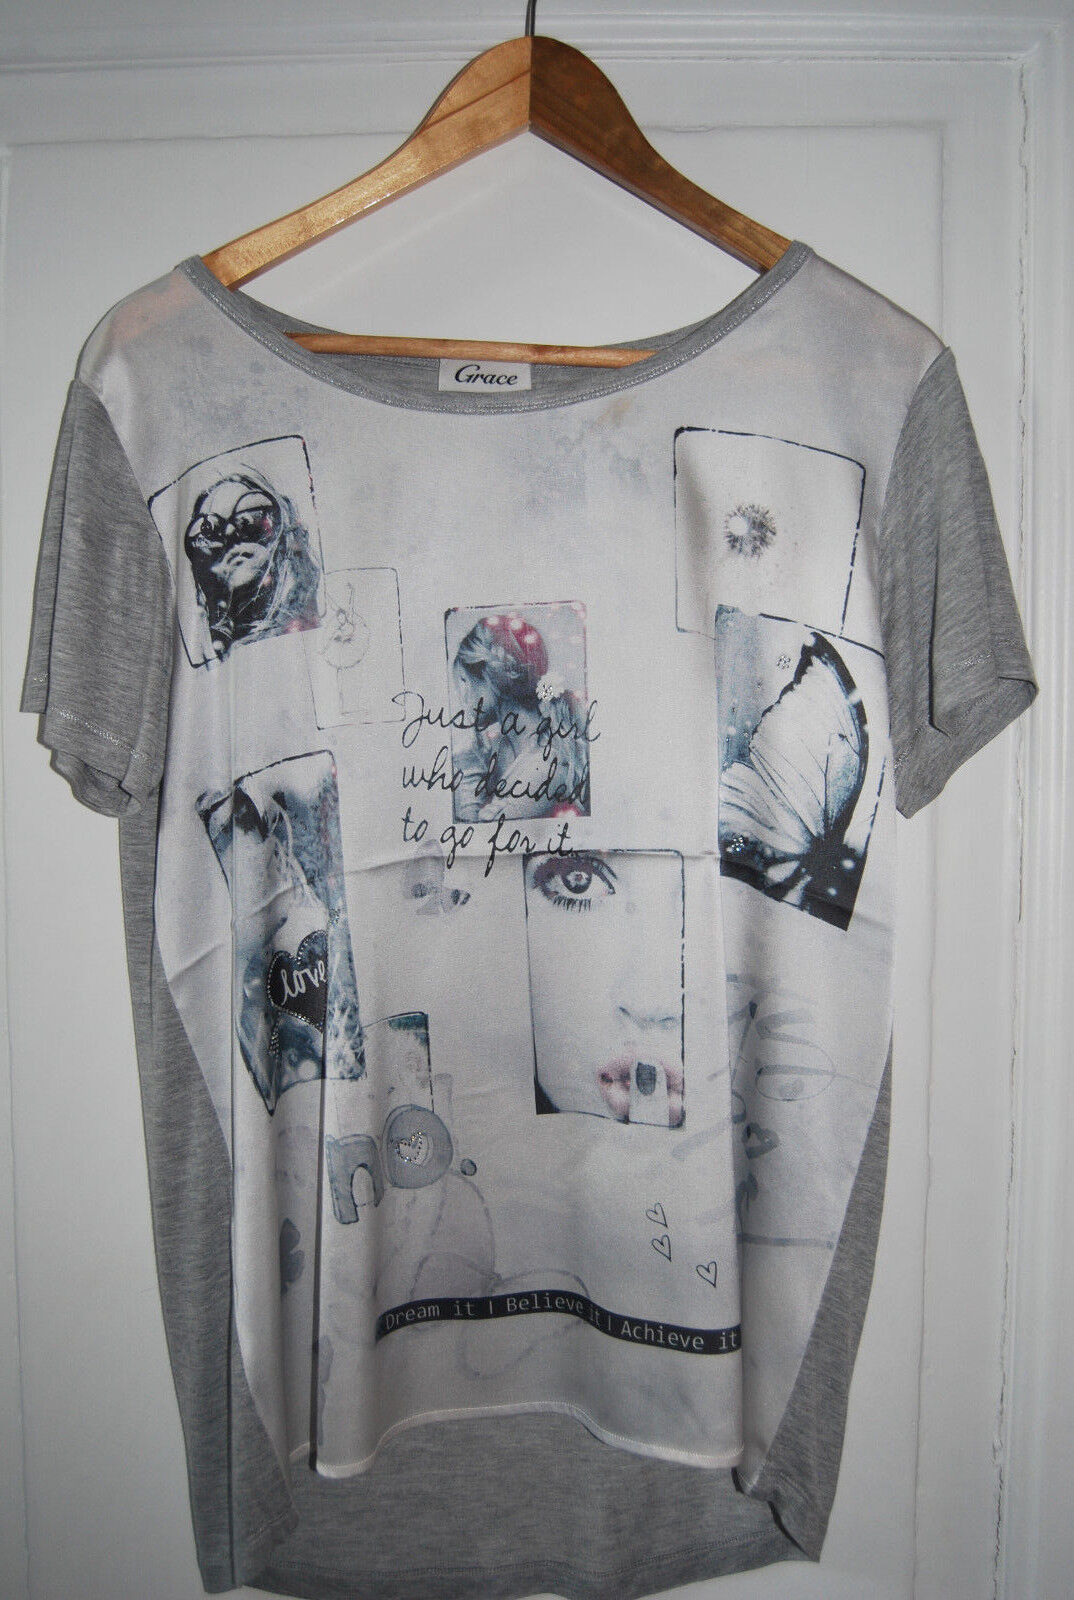 Grace Damen T-Shirt mit Seiden-Anteil